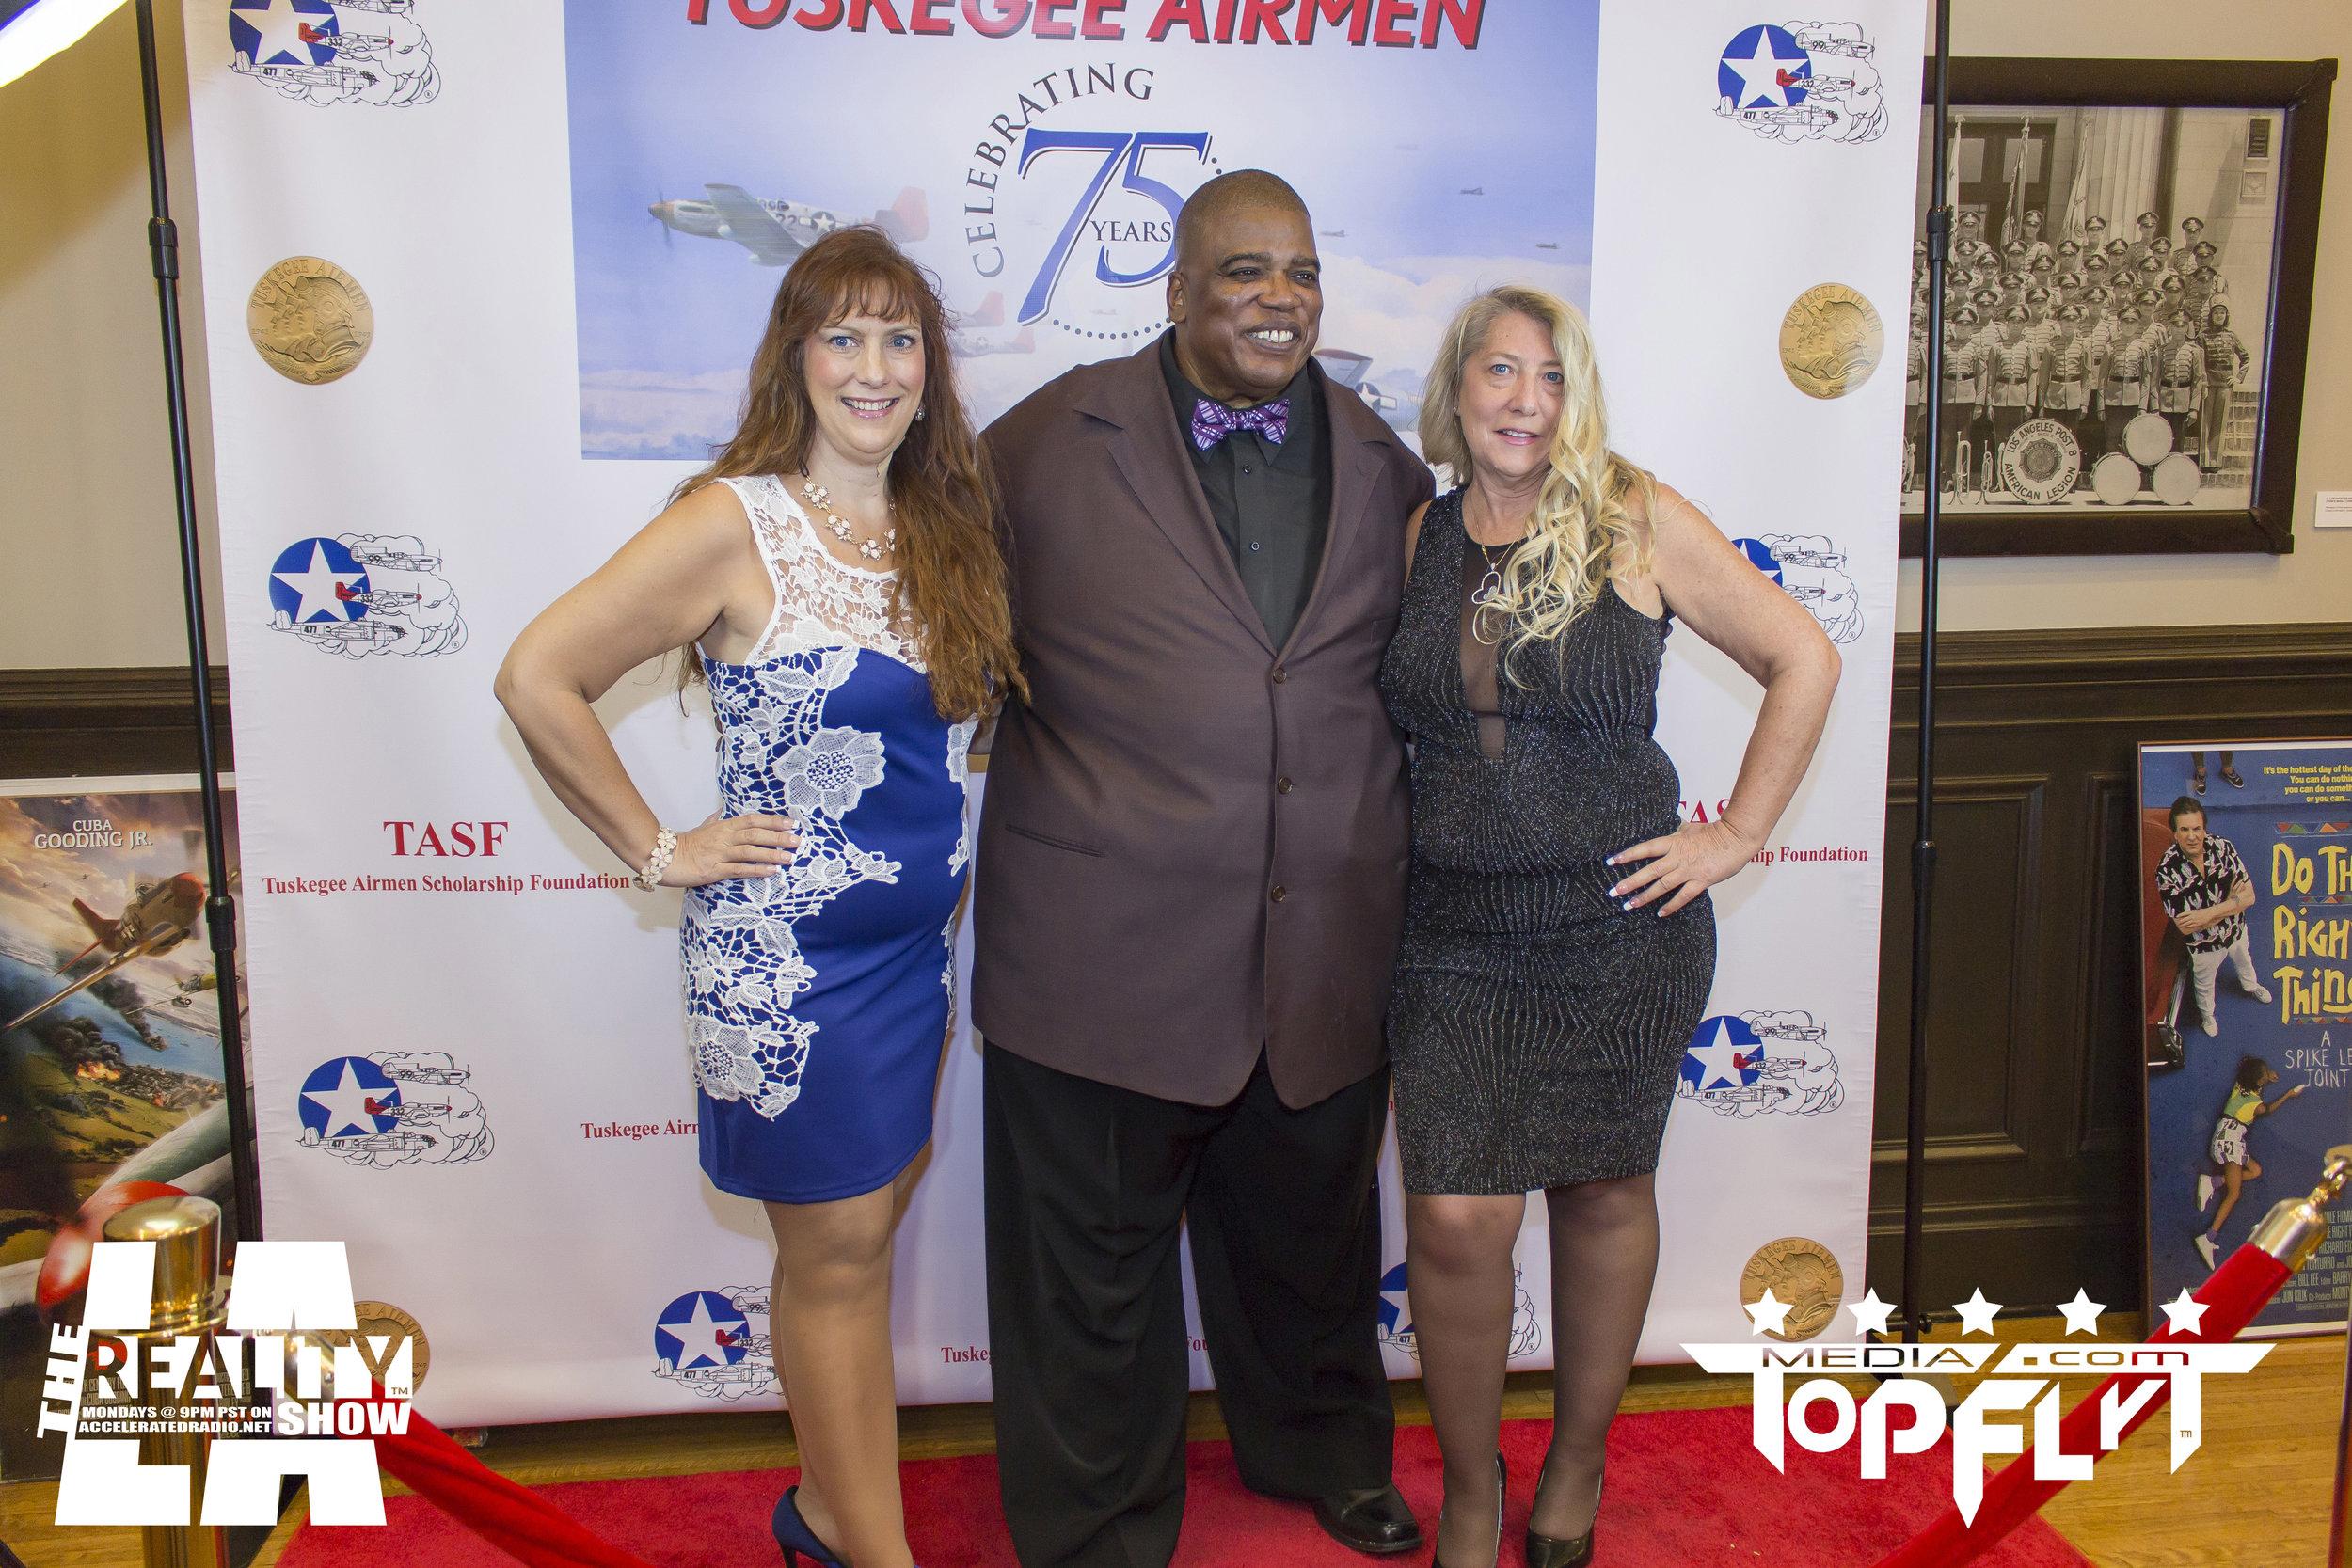 The Reality Show LA - Tuskegee Airmen 75th Anniversary VIP Reception_41.jpg